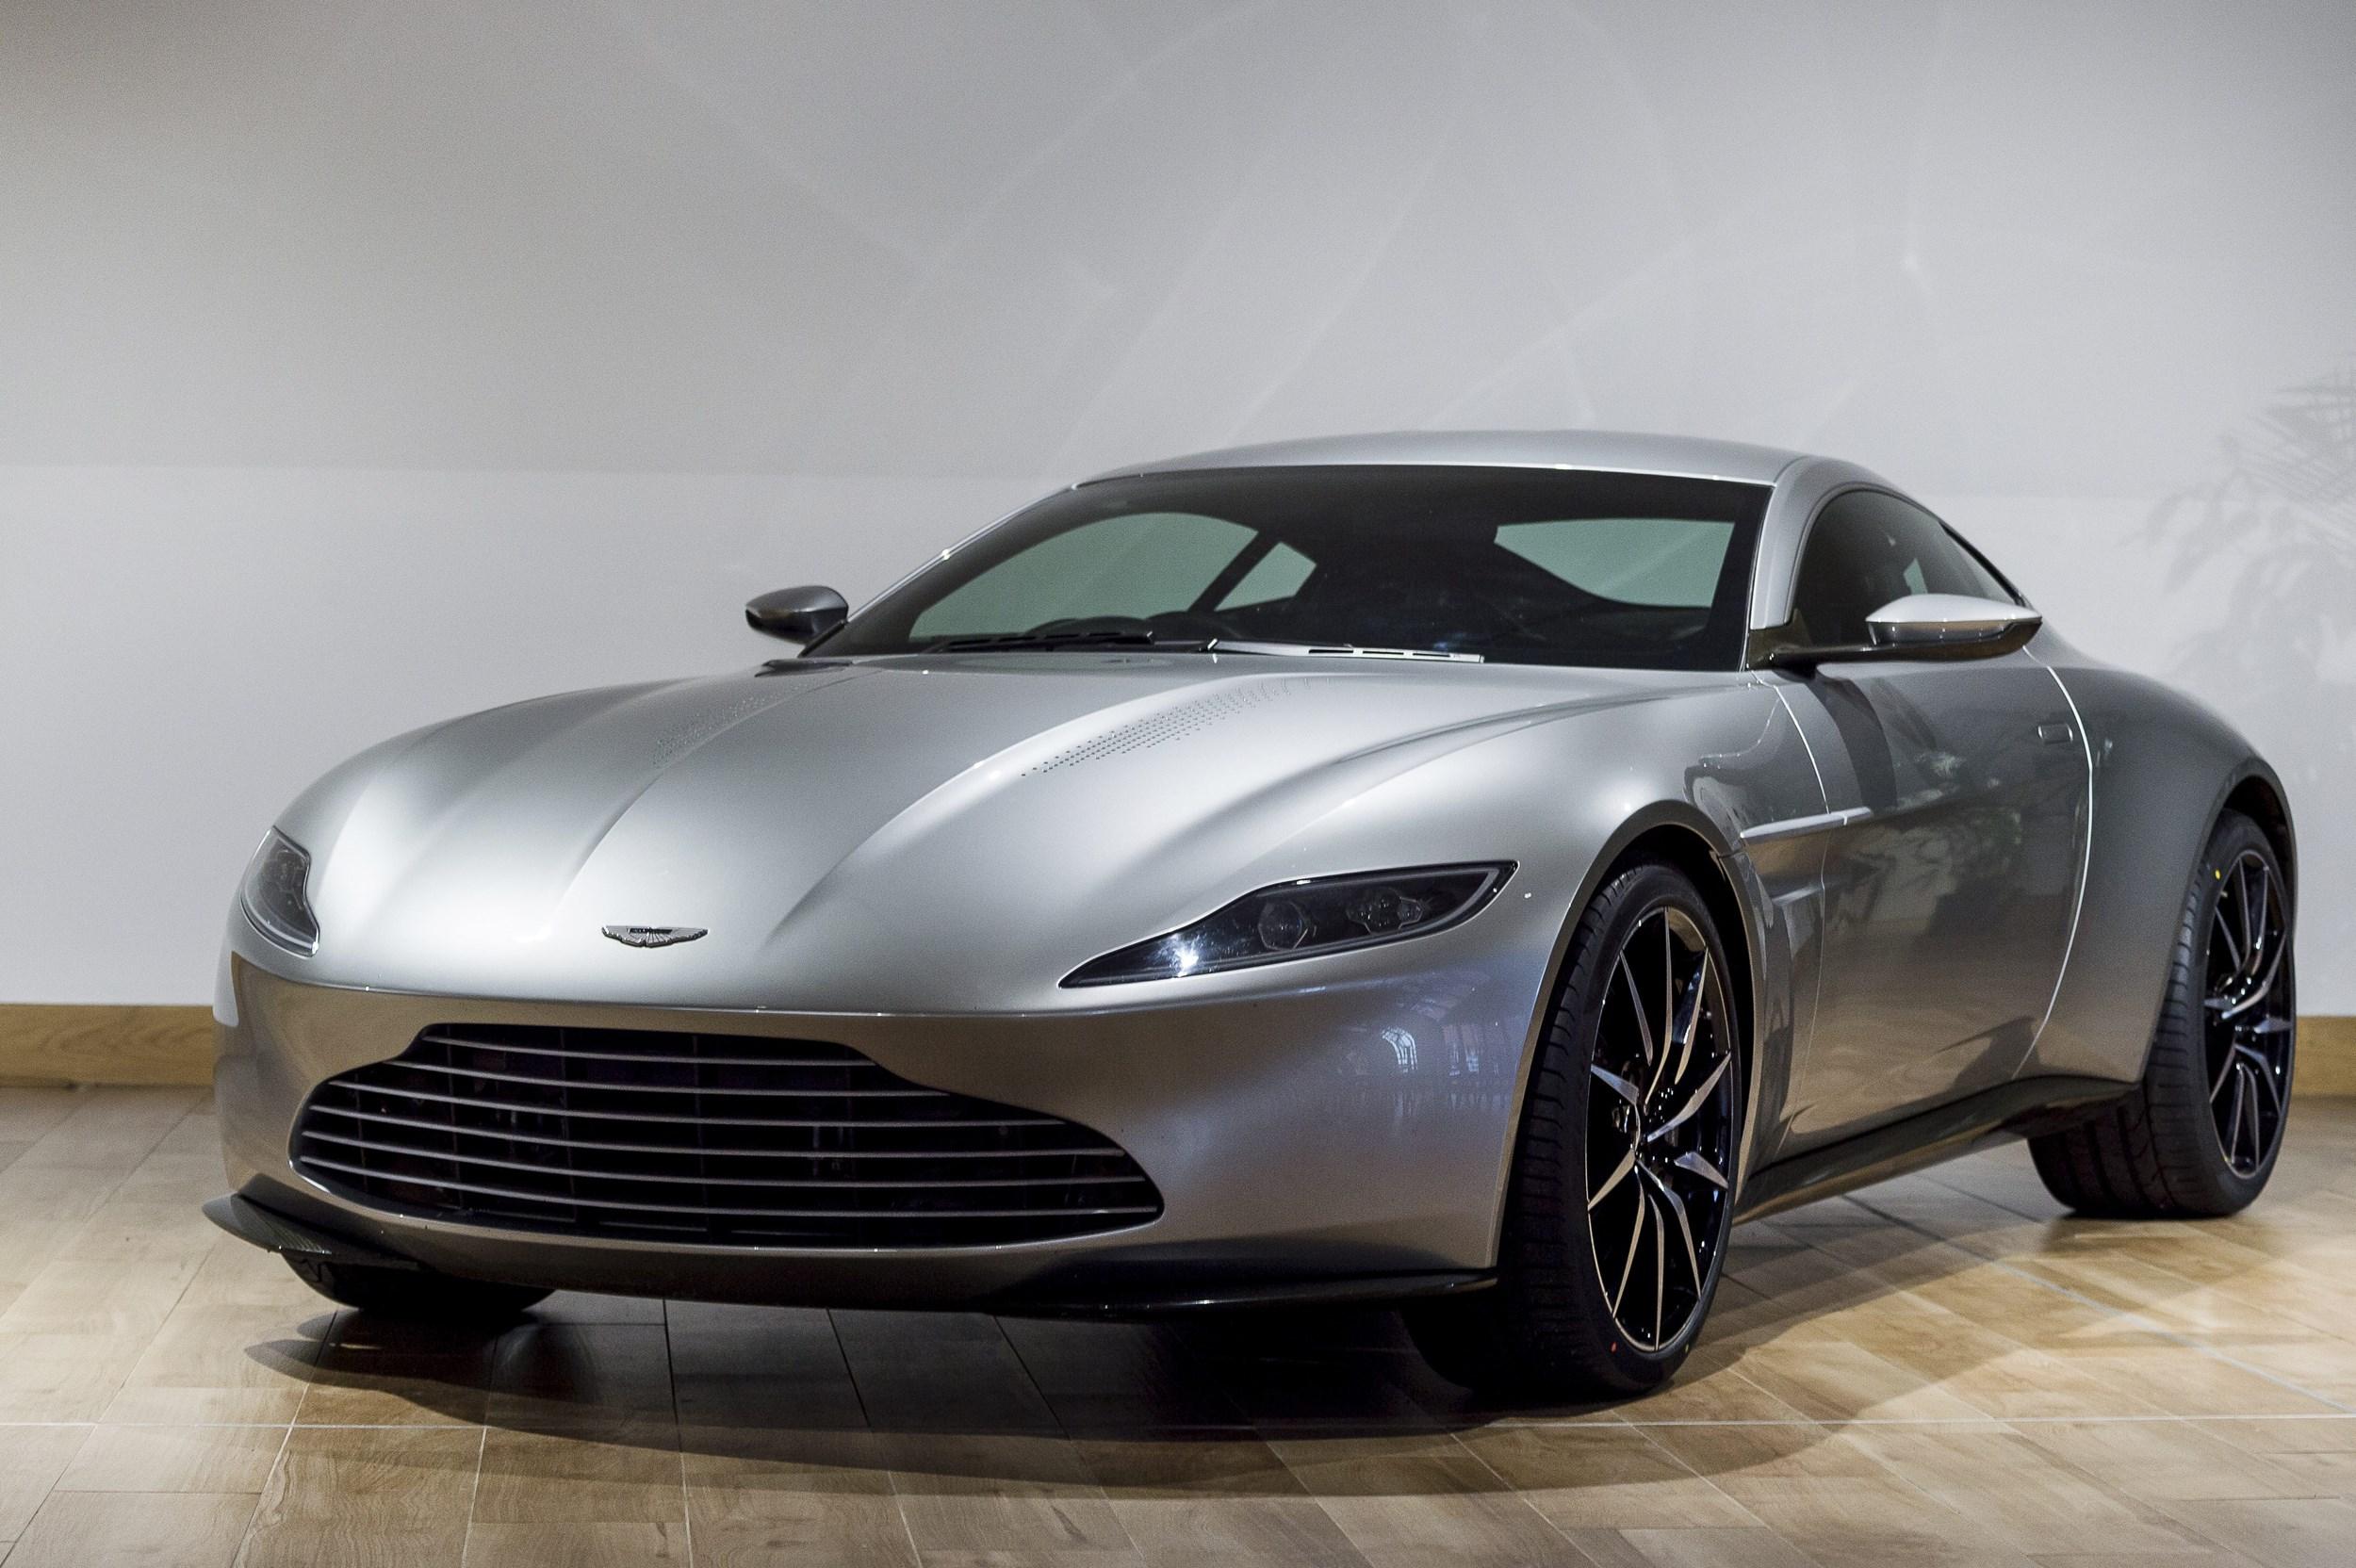 James Bond S New Aston Martin Arrives For Uk Dealer Tour Ahead Of Spectre Movie Car Model News